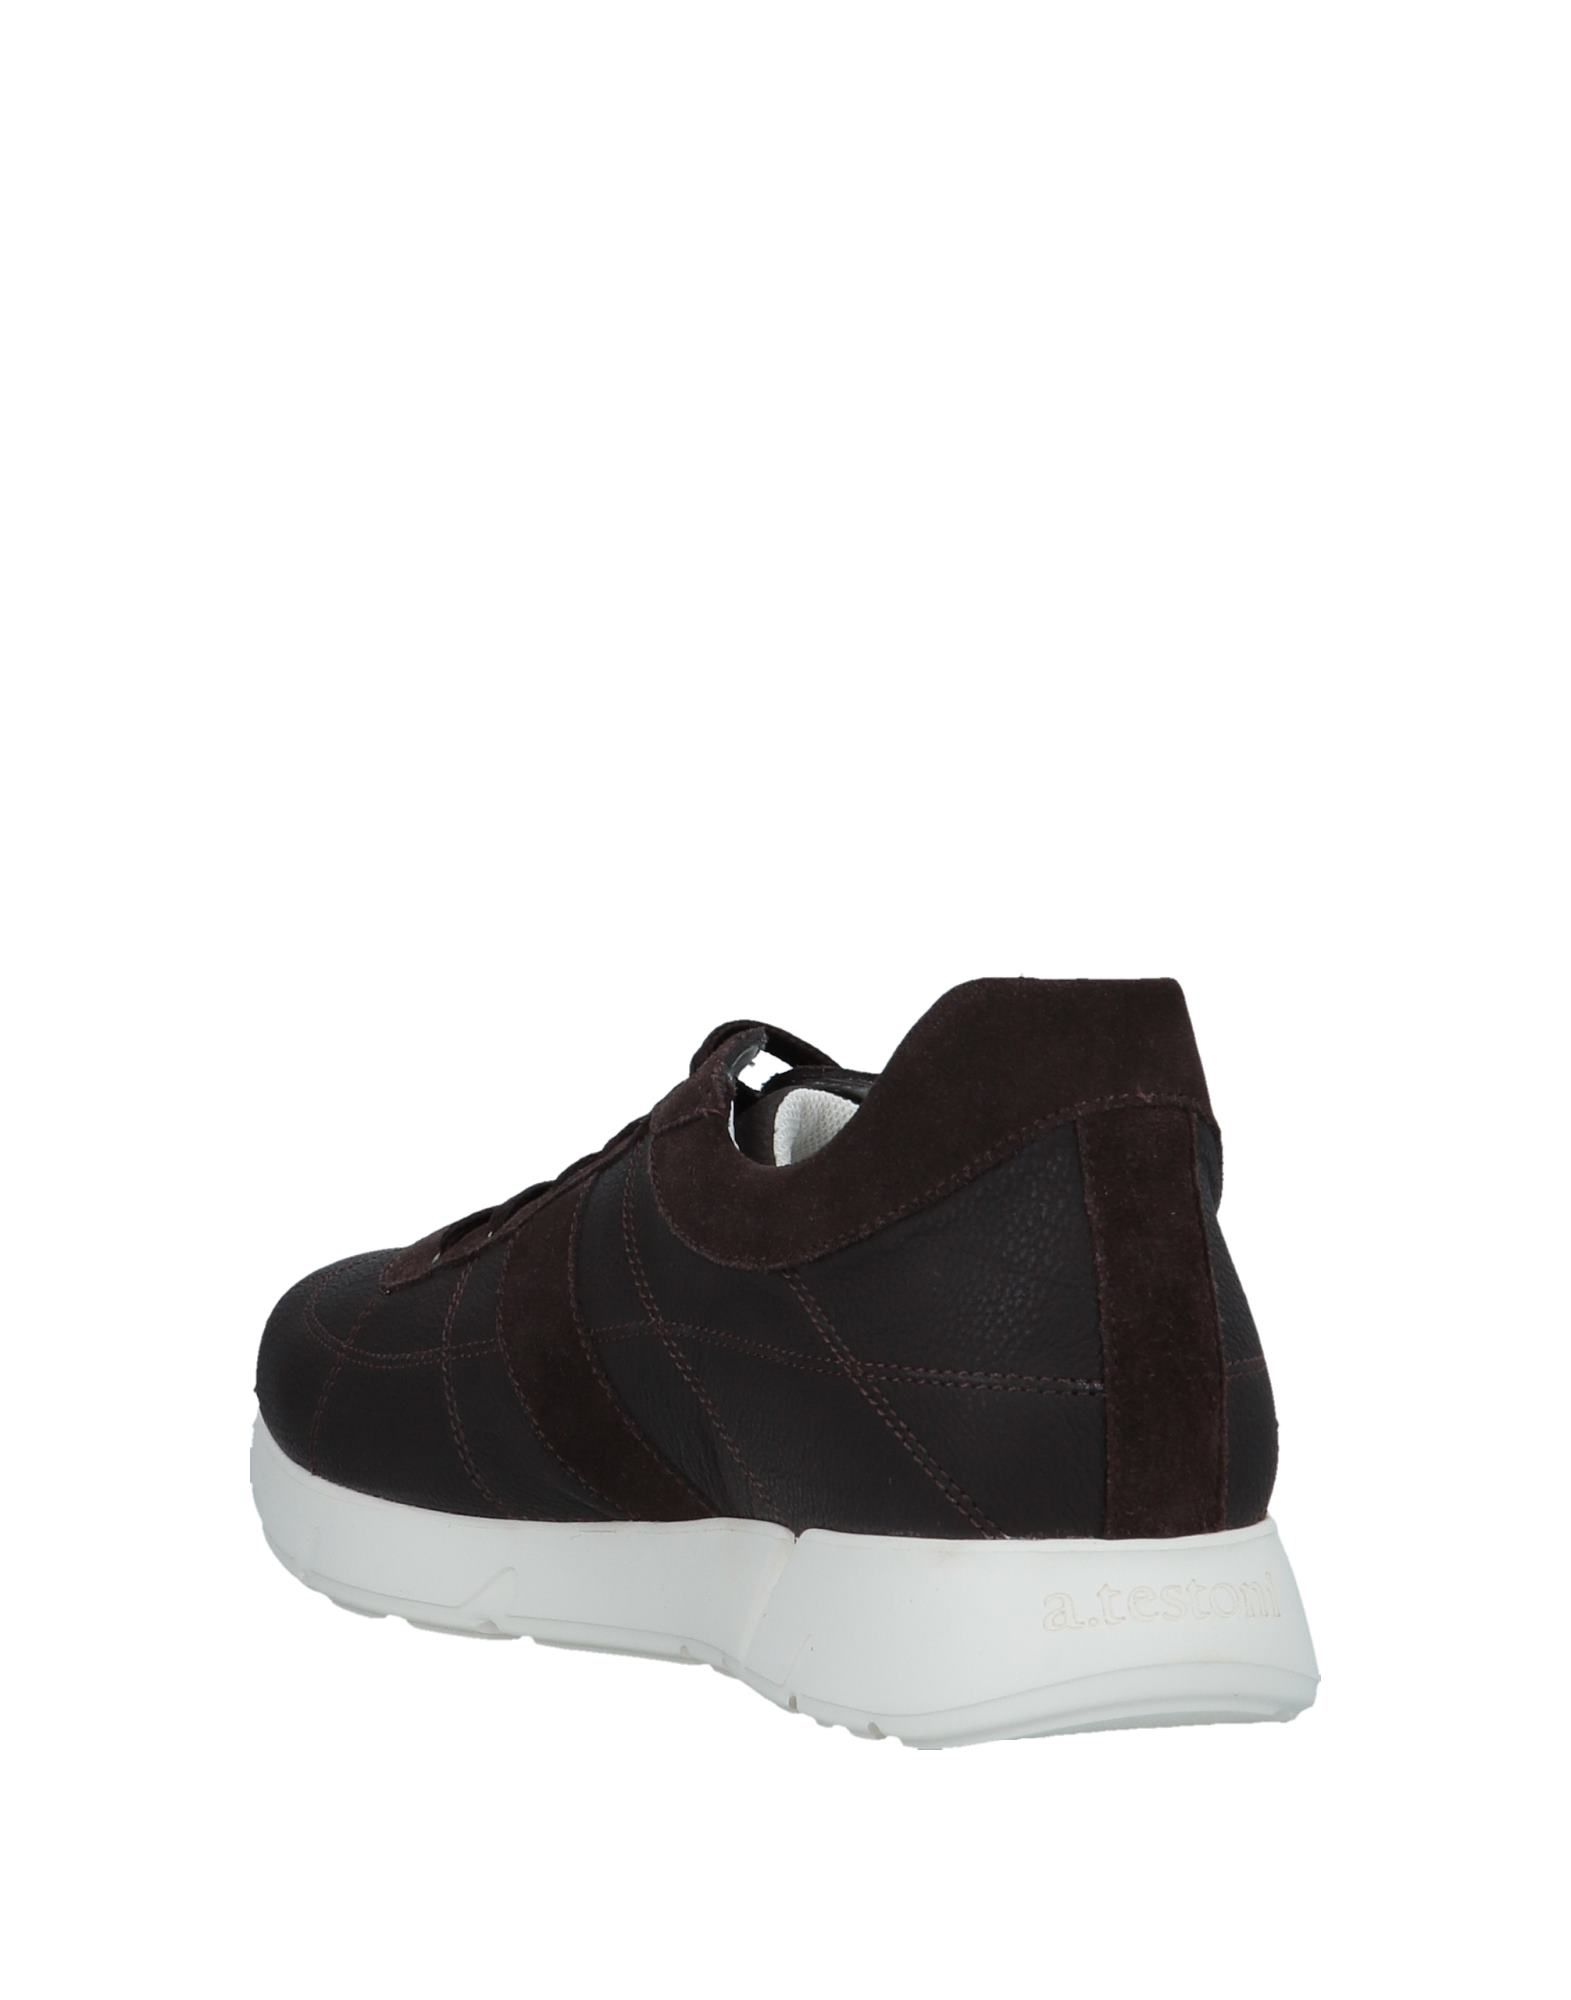 A.Testoni Herren Sneakers Herren A.Testoni  11543669NM d9eb20